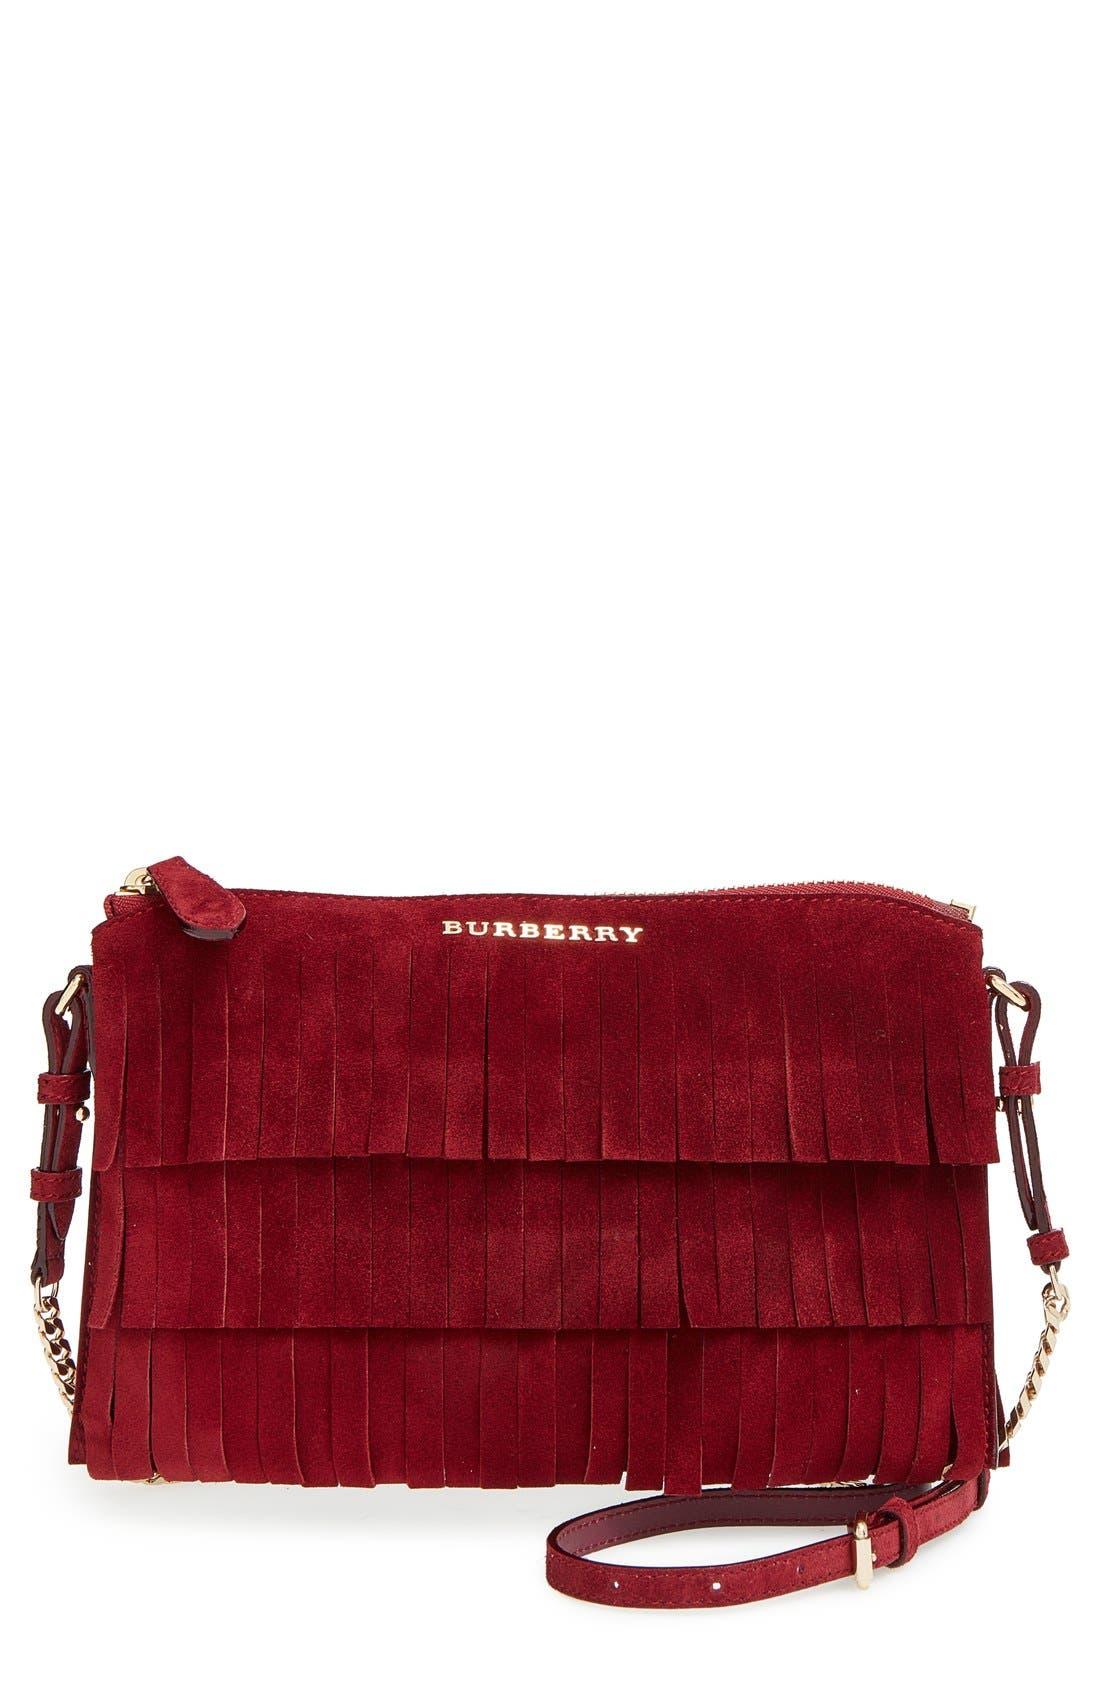 BURBERRY 'Peyton' Fringe Suede Crossbody Bag, Main, color, 600